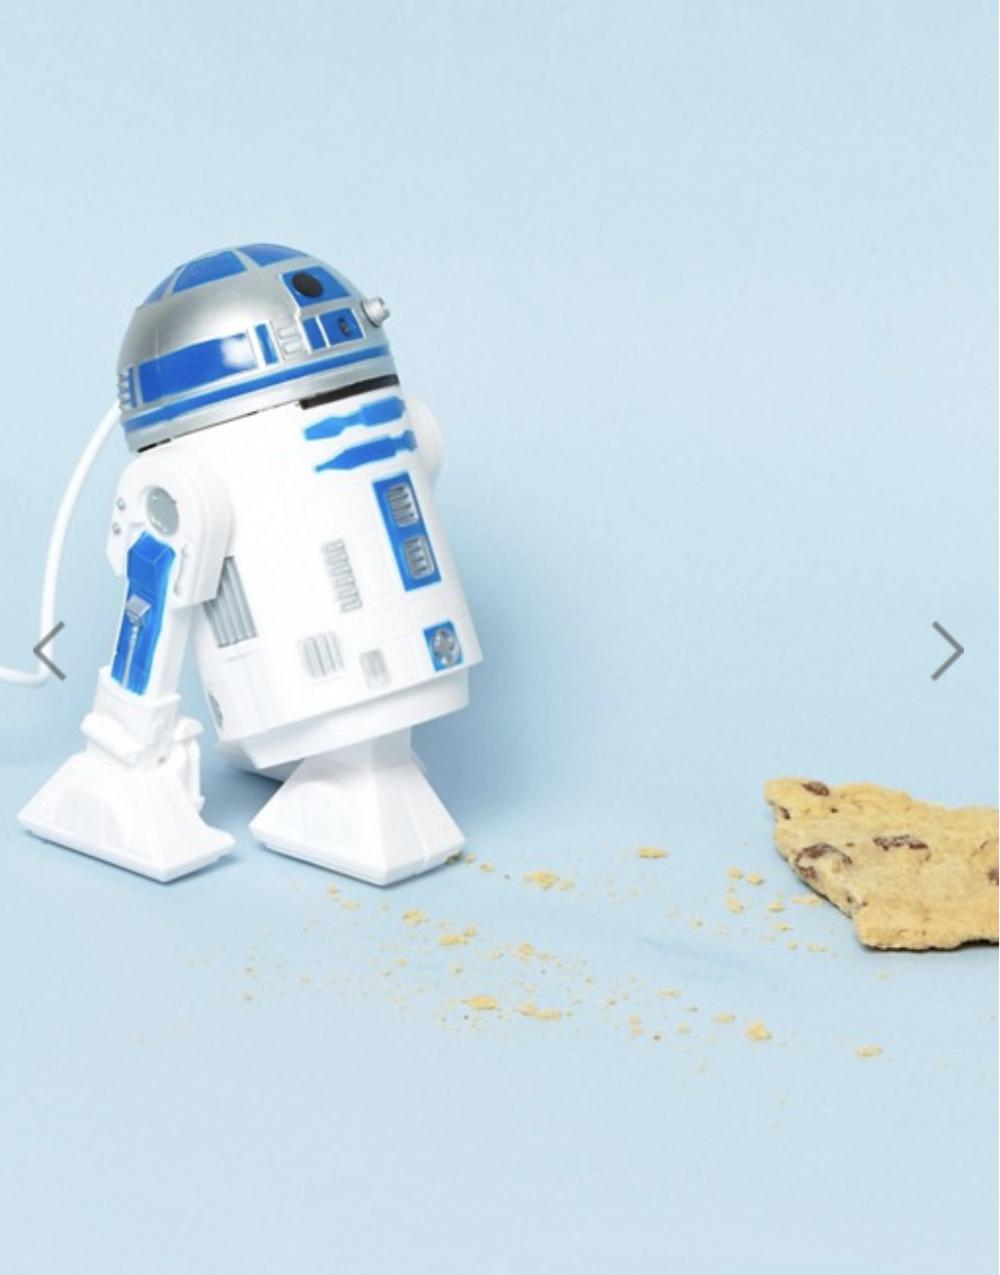 Star Wars R2-D2 Desktop Vacuum DT